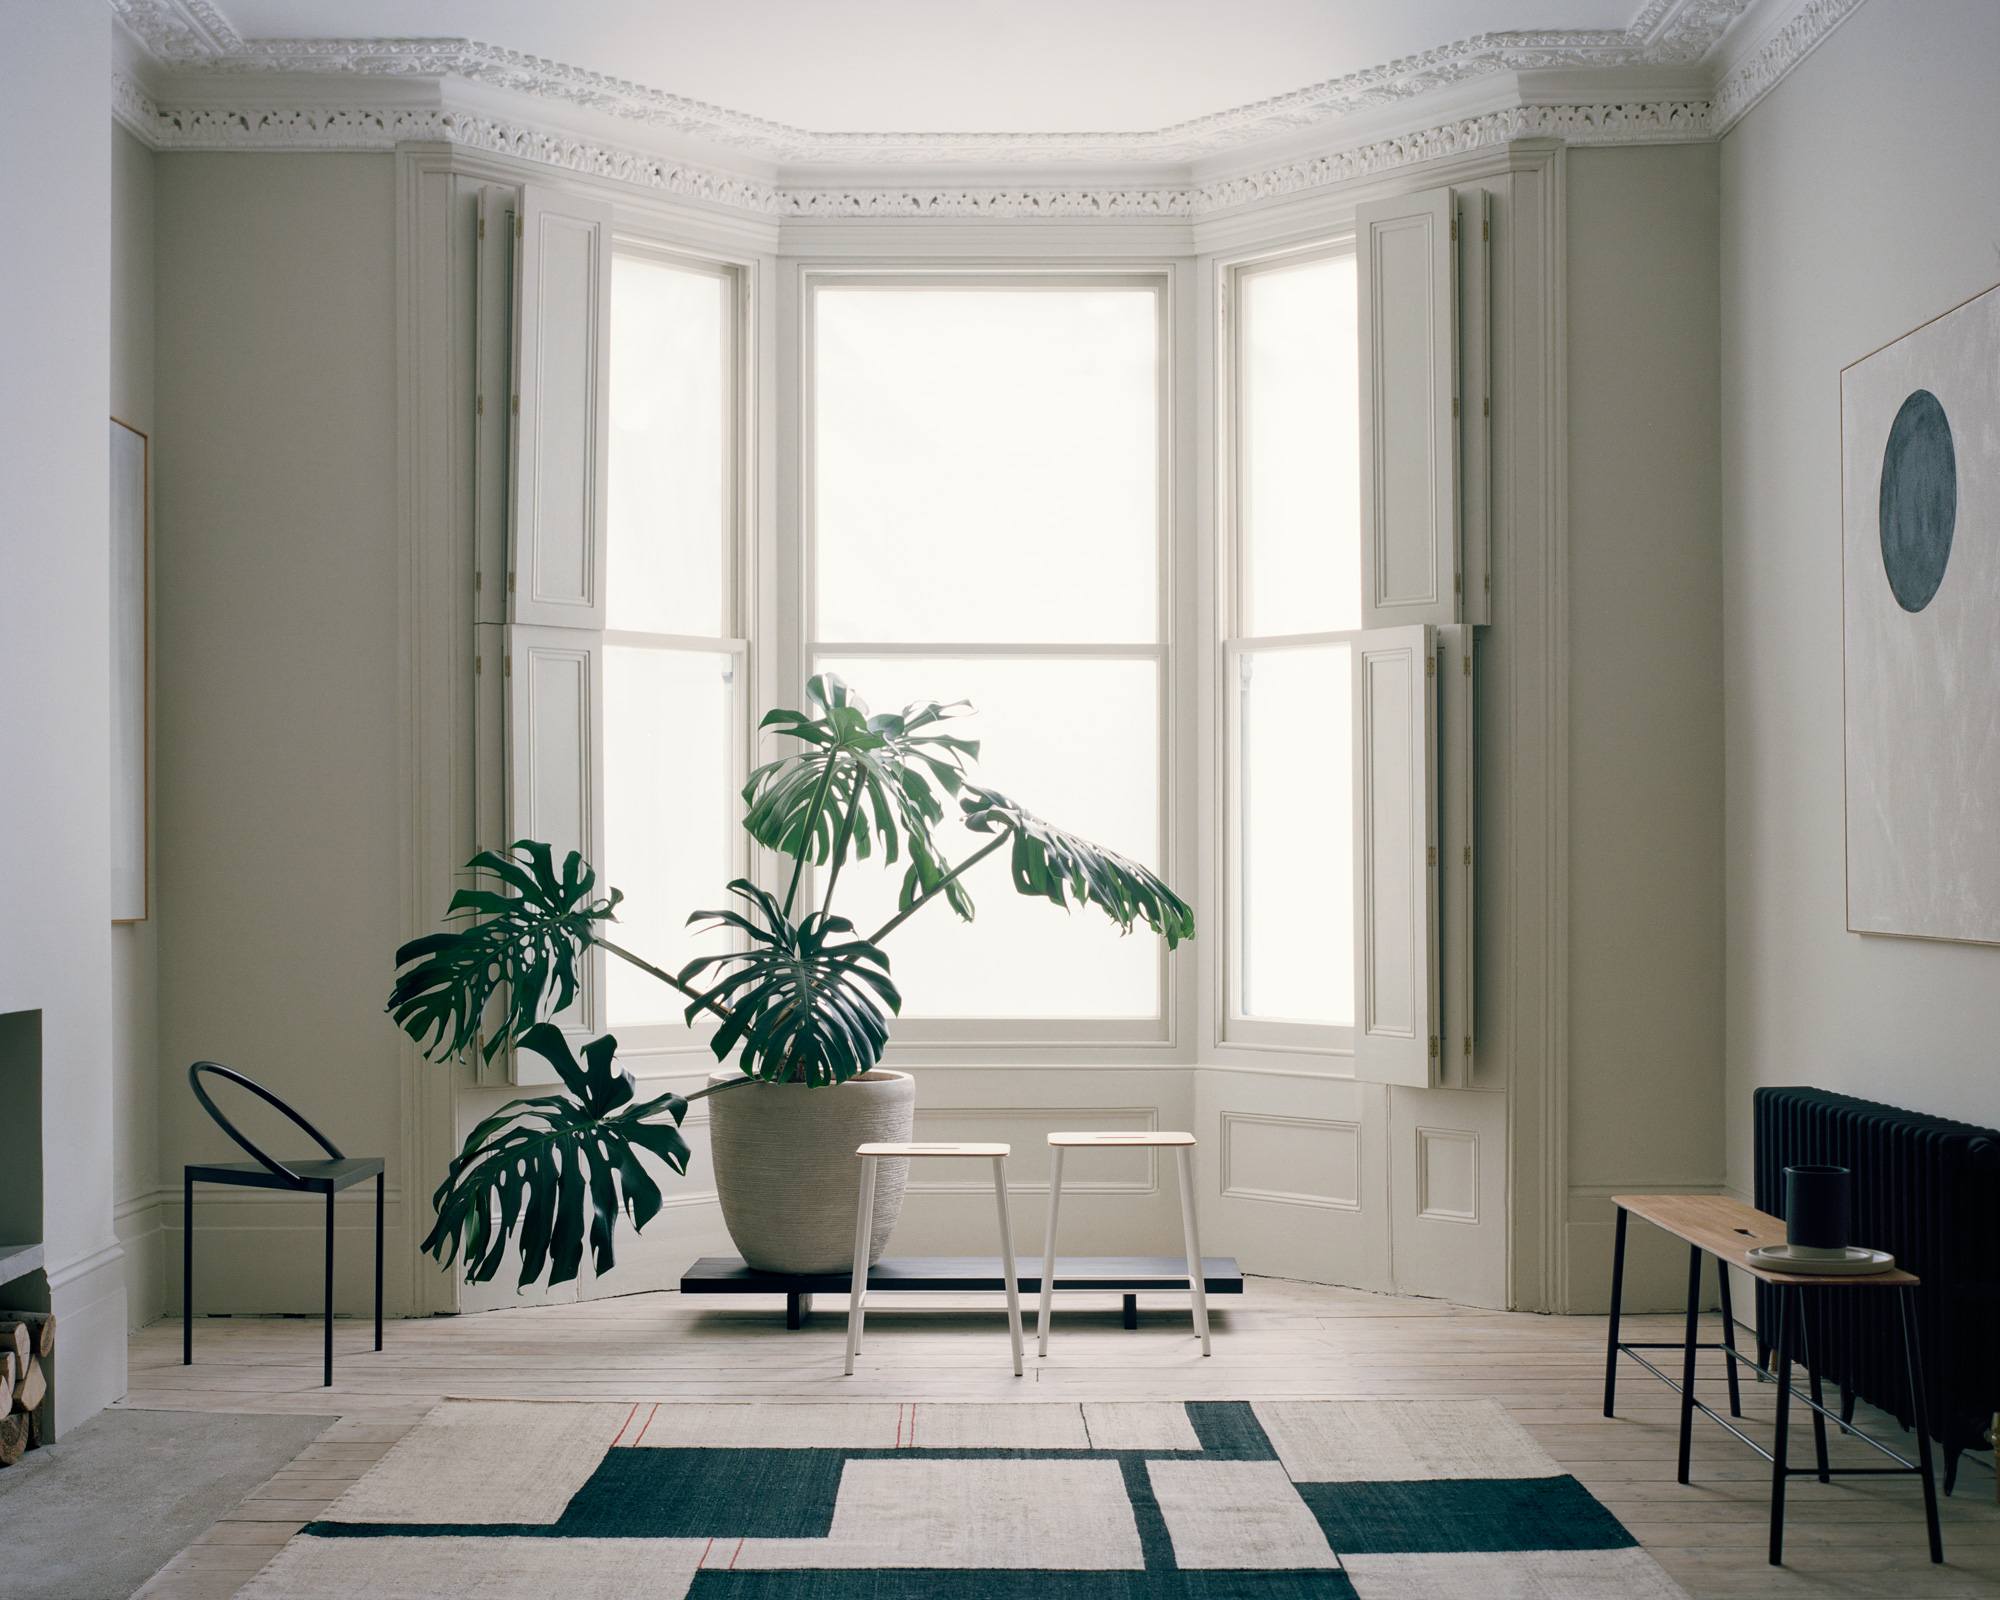 House_of_Grey_Exhibition_windows_foliage_bench.jpg